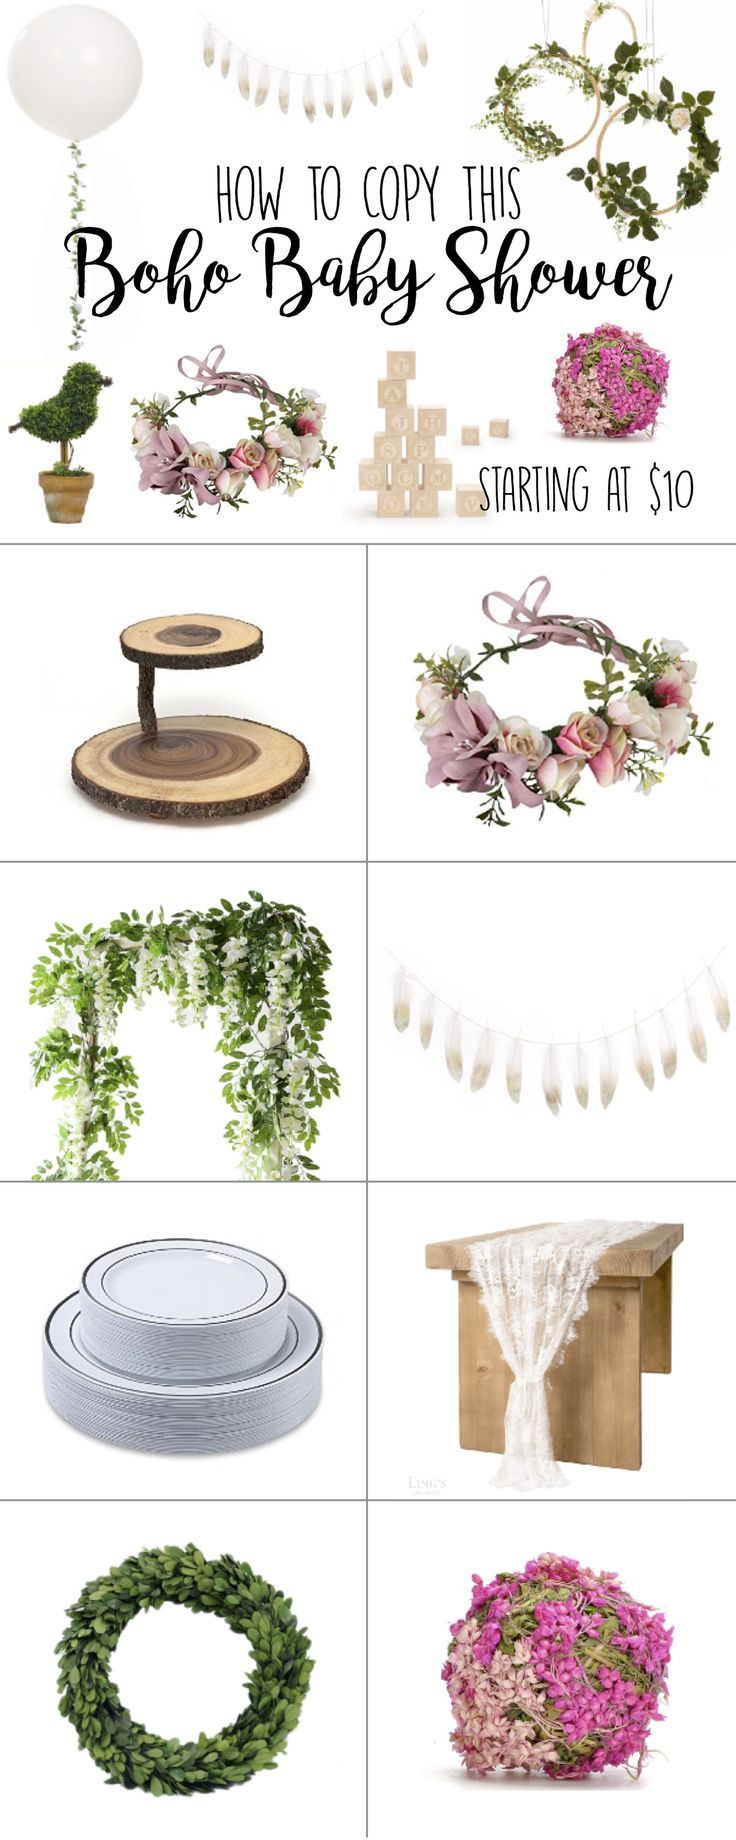 Boho Baby Shower Ideas – Elegant theme for boy or …